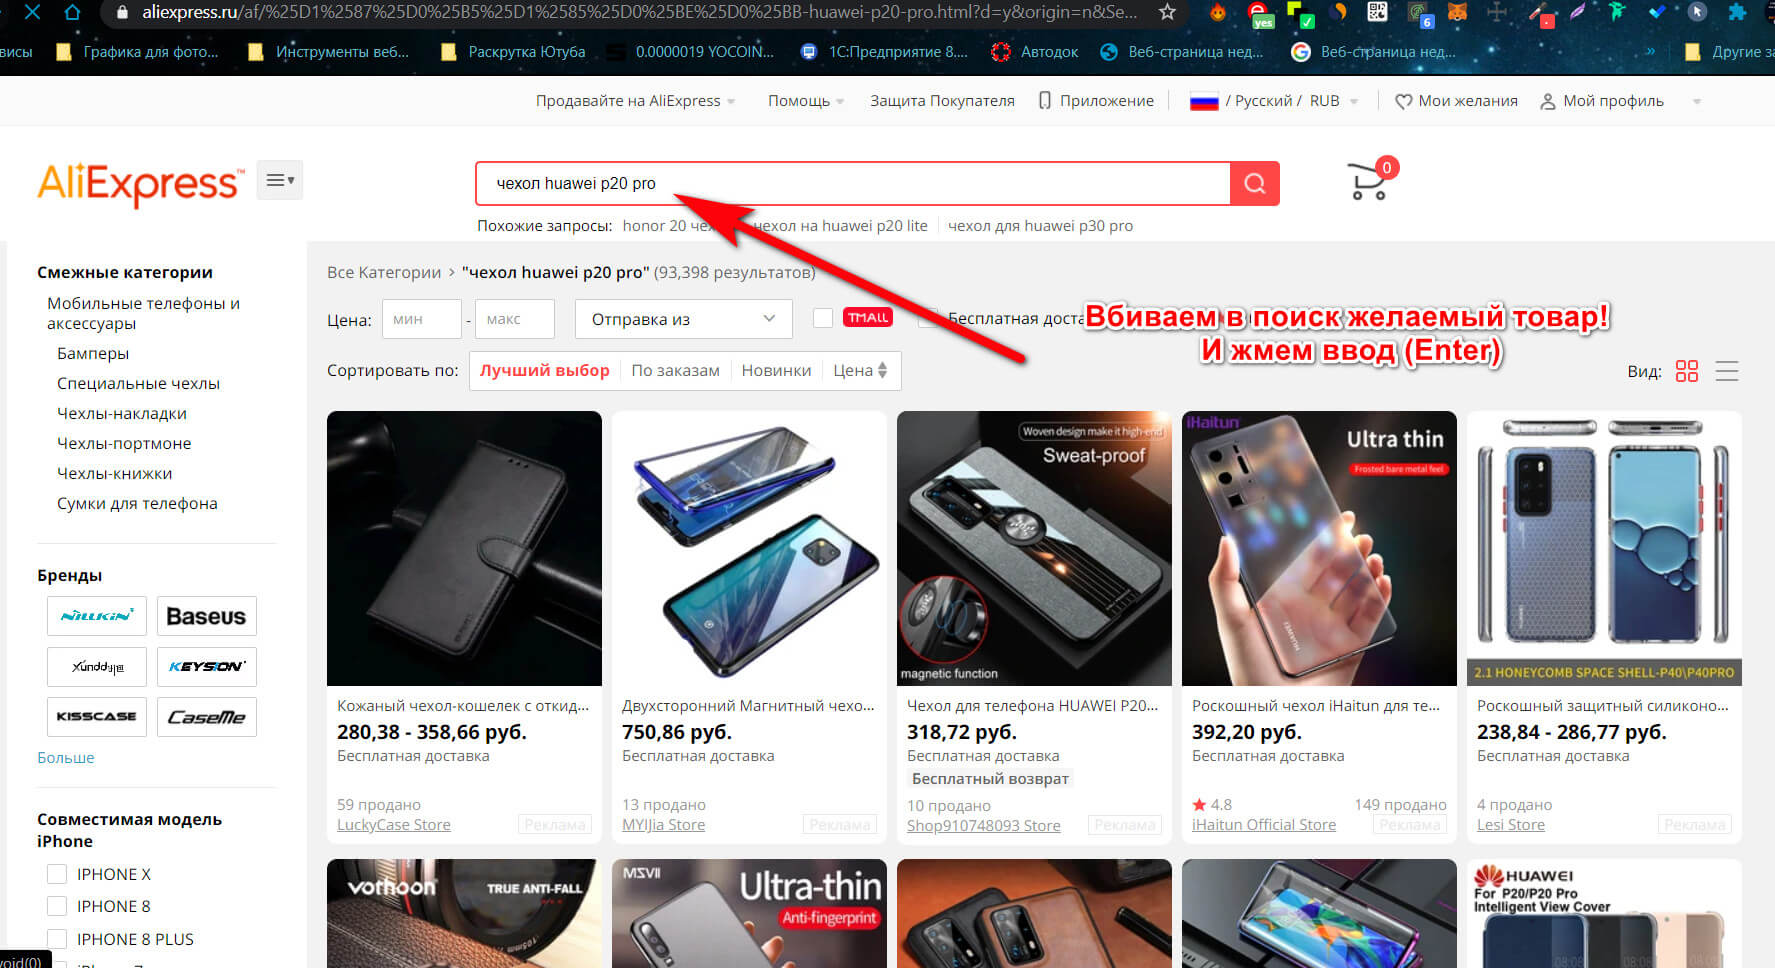 Главная страница поиска товара на Aliexpress